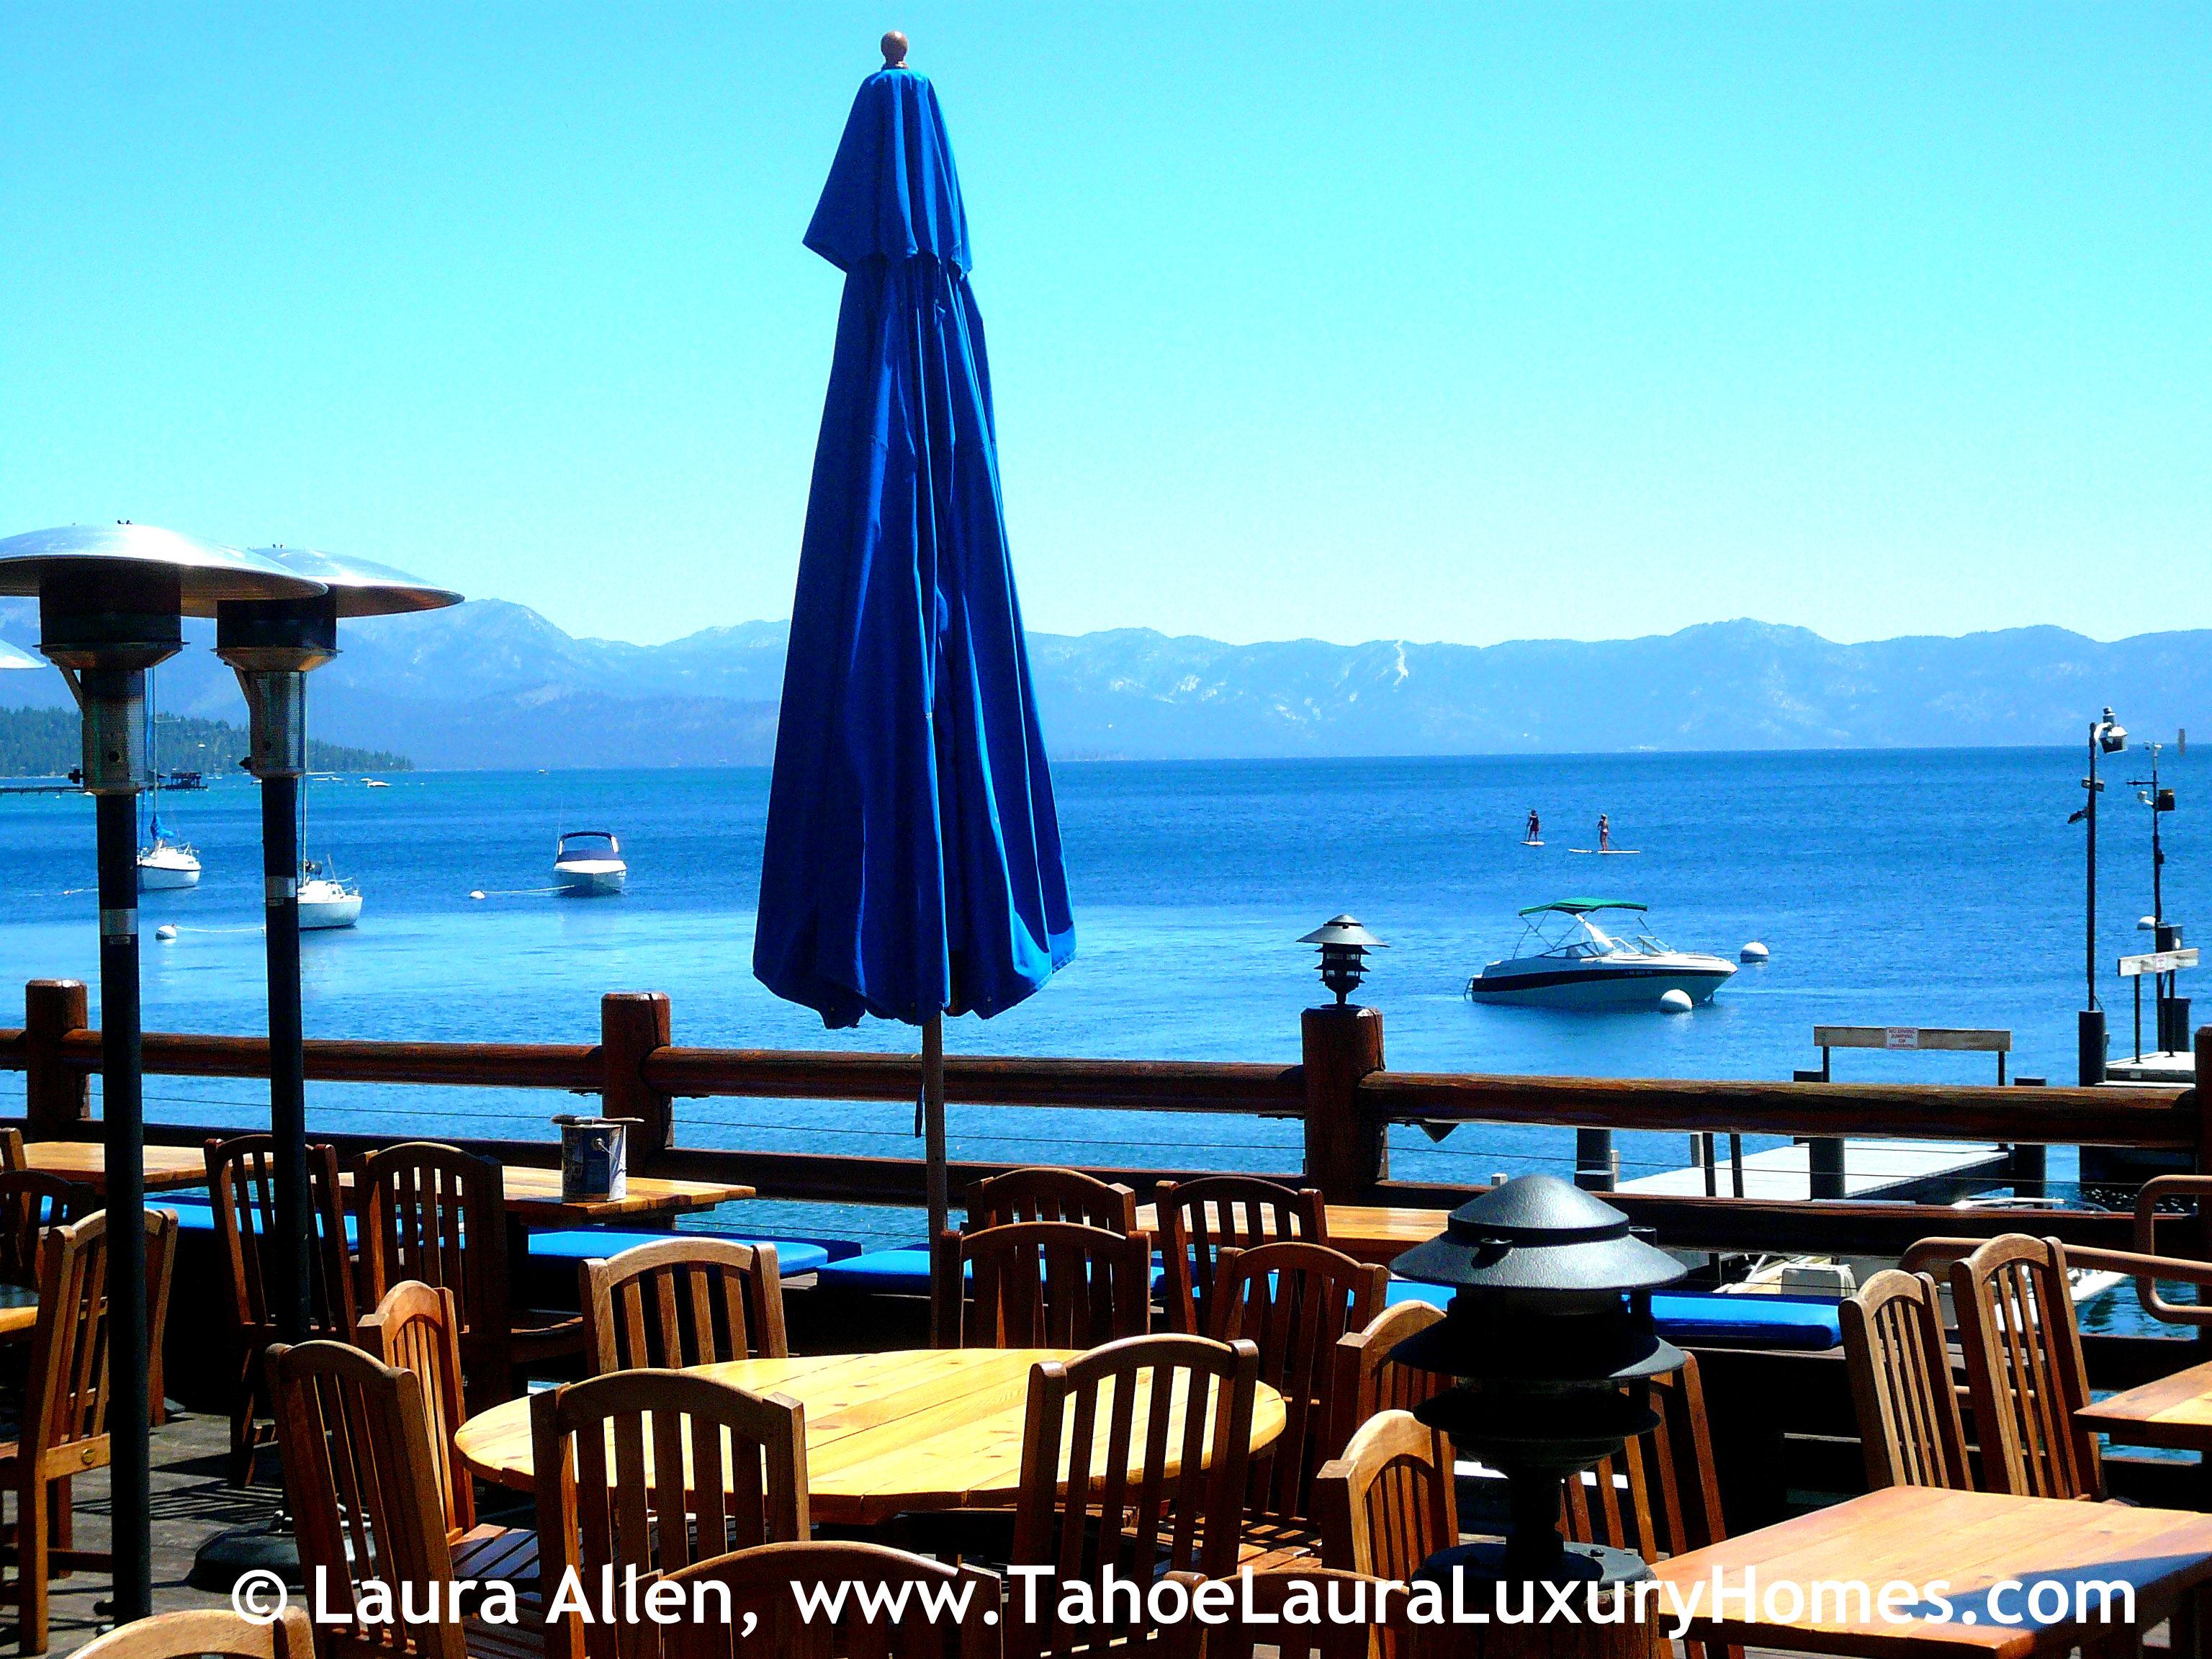 Sunnyside Resort Restaurant And Lodge Tahoe City